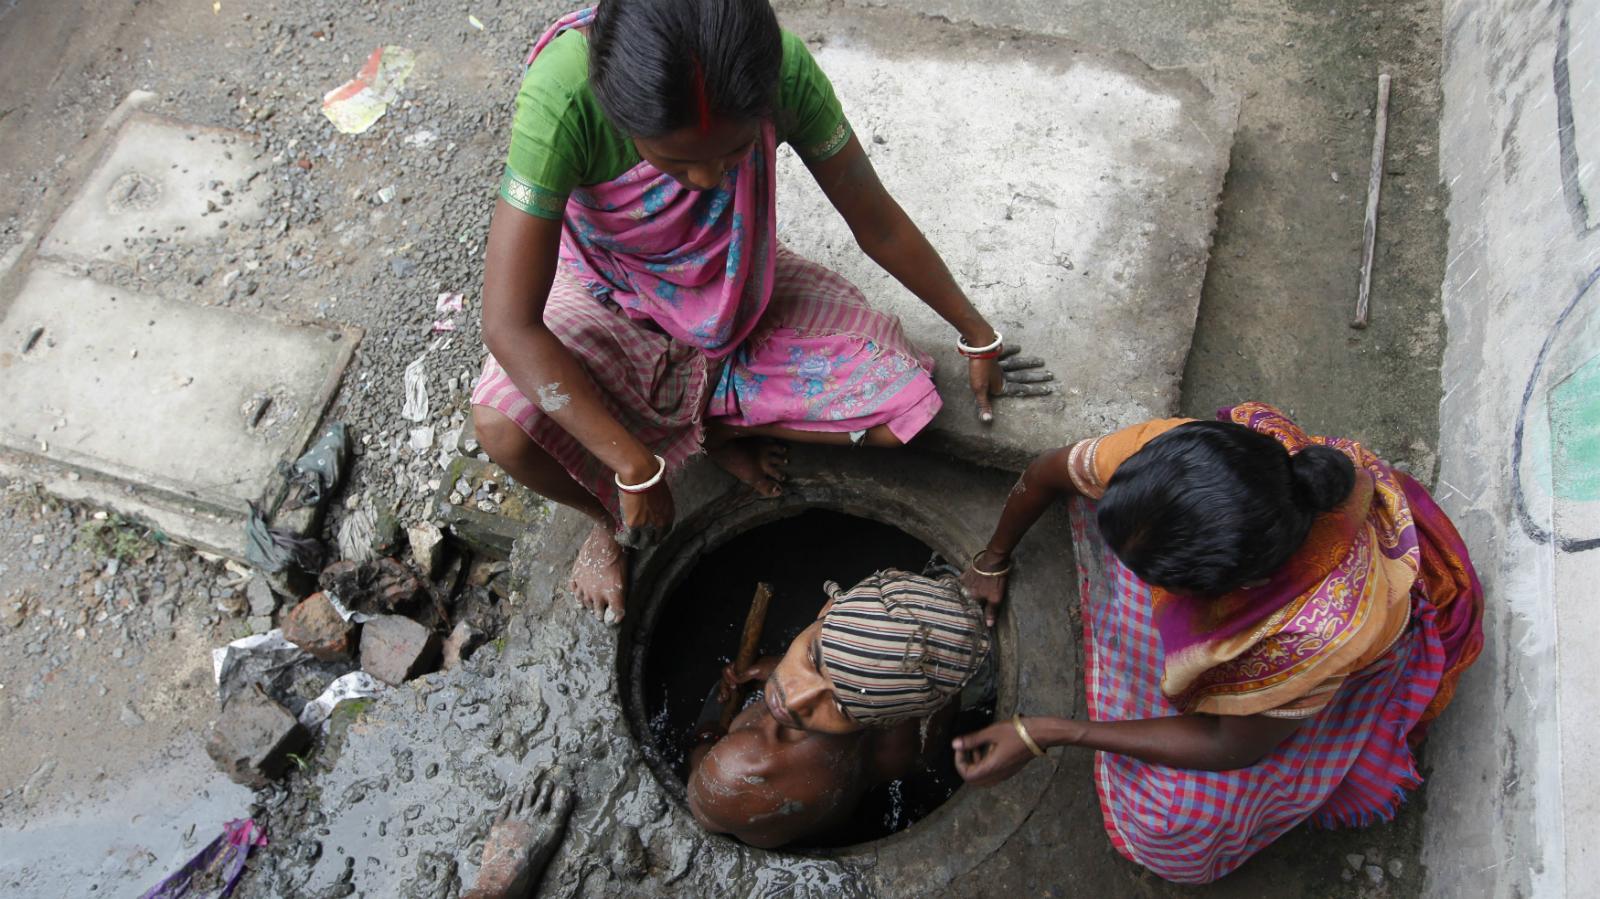 A labourer cleans an underground drain in Kolkata September 20, 2010.